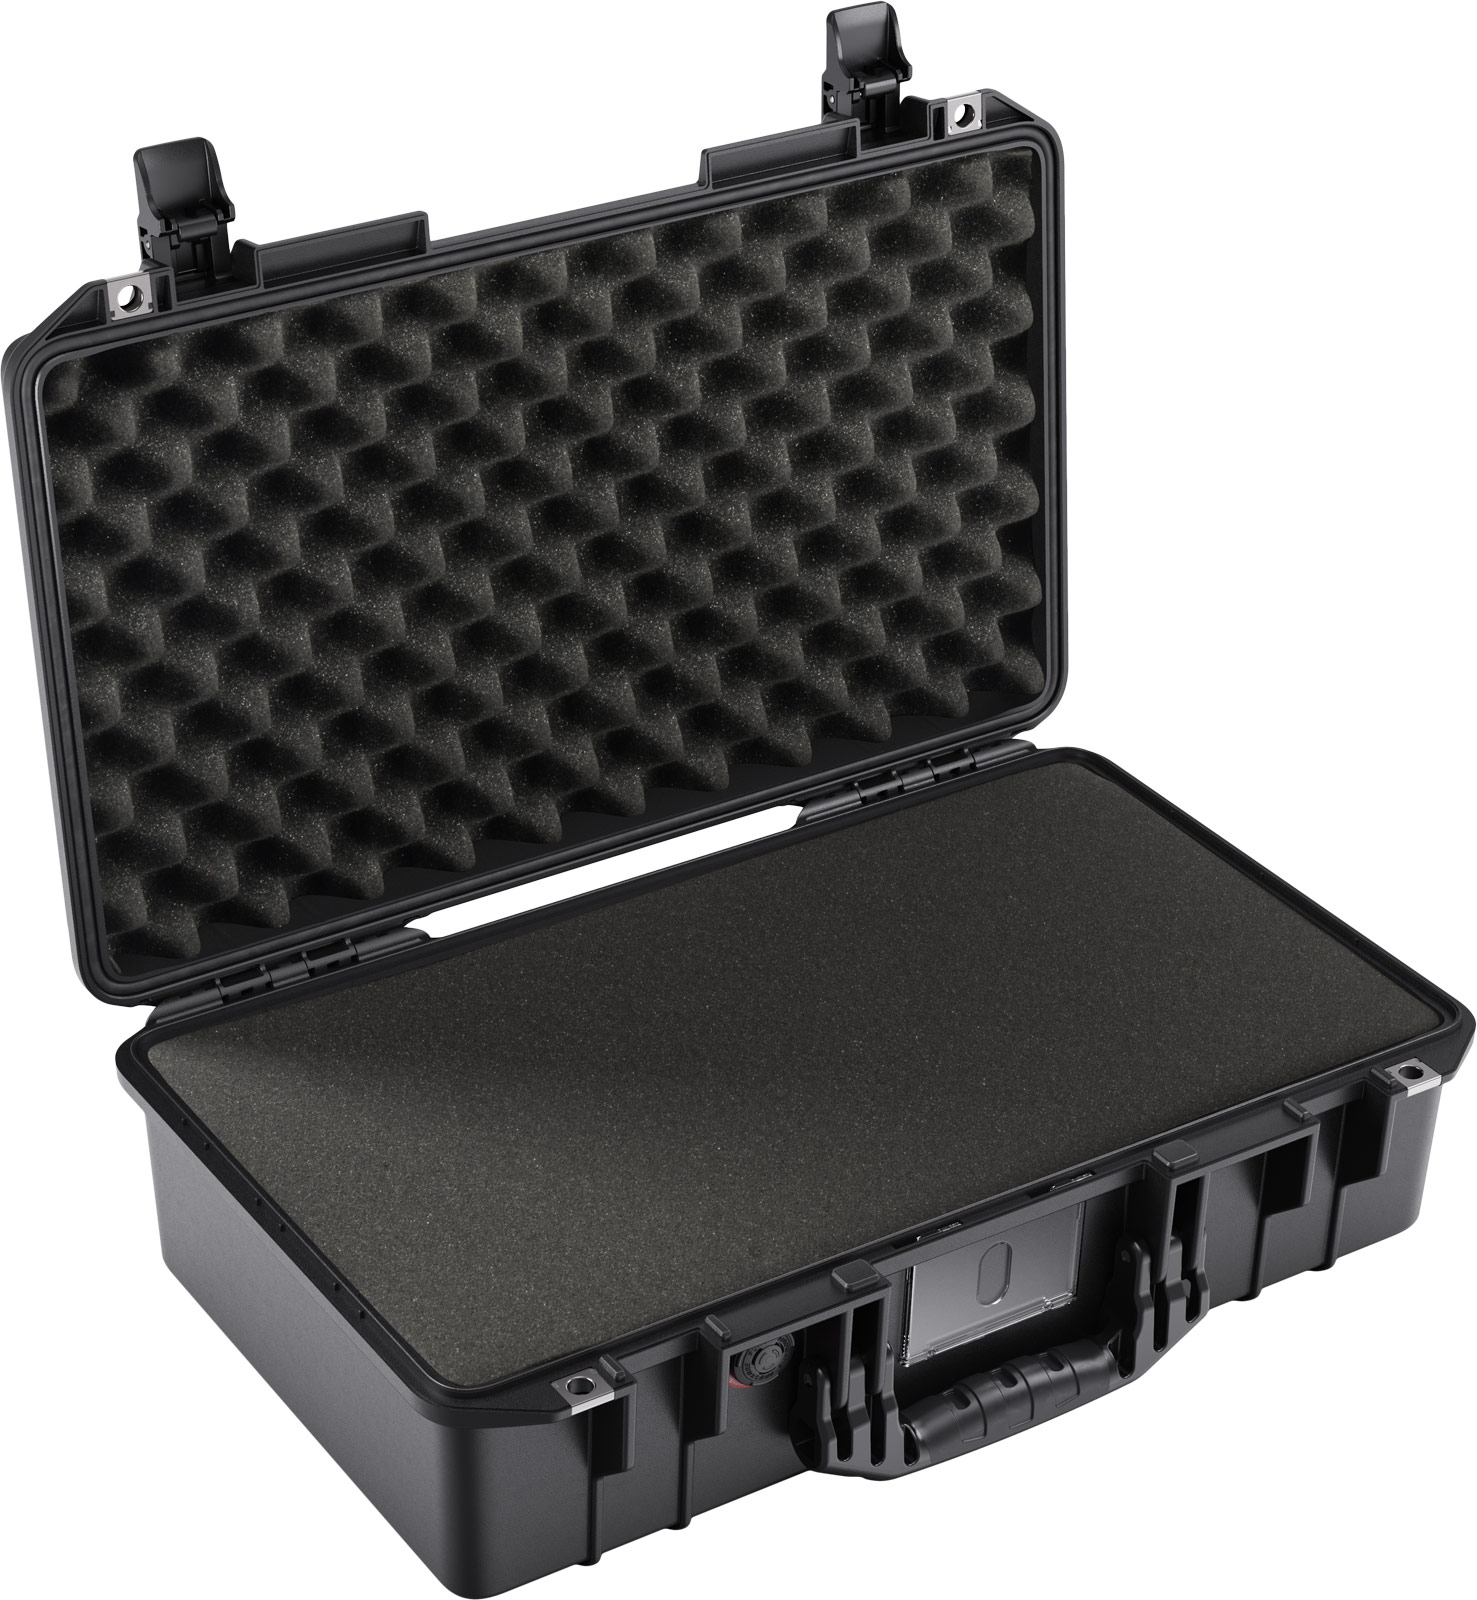 pelican 1525 air foam black laptop case